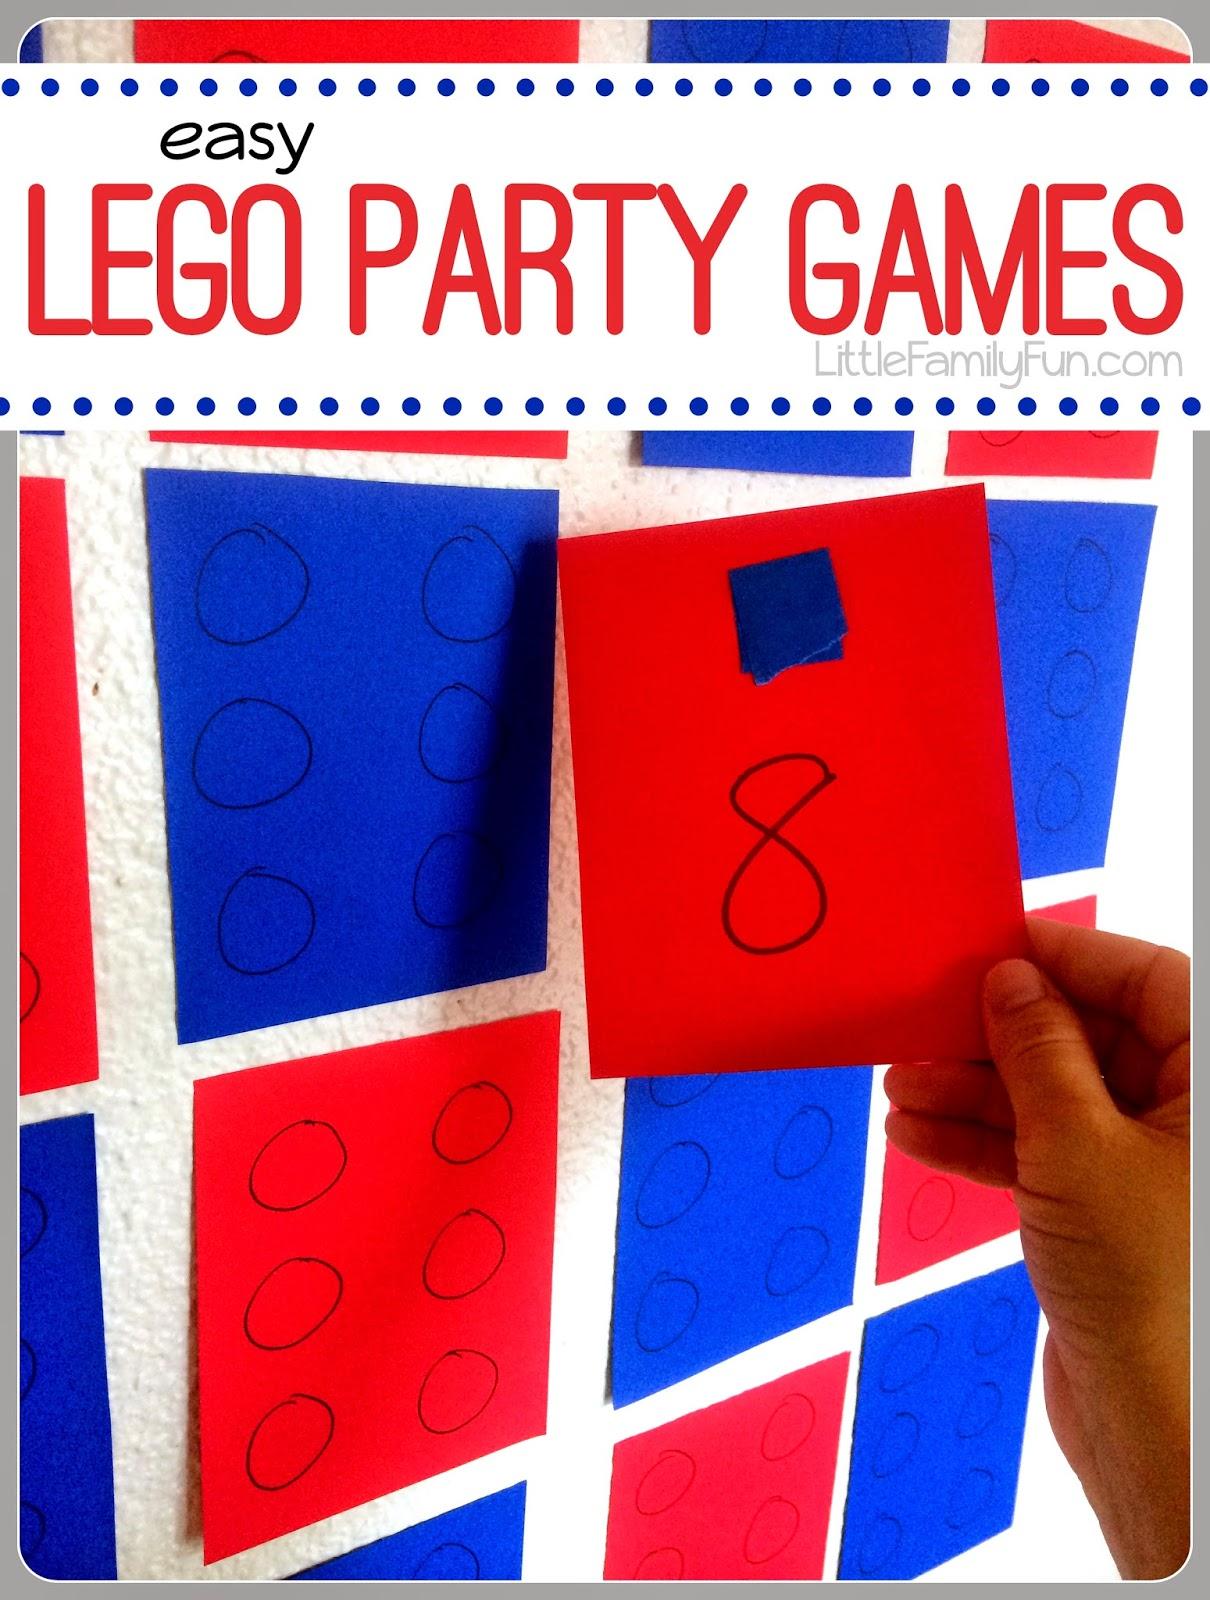 http://www.littlefamilyfun.com/2014/04/lego-party-games.html